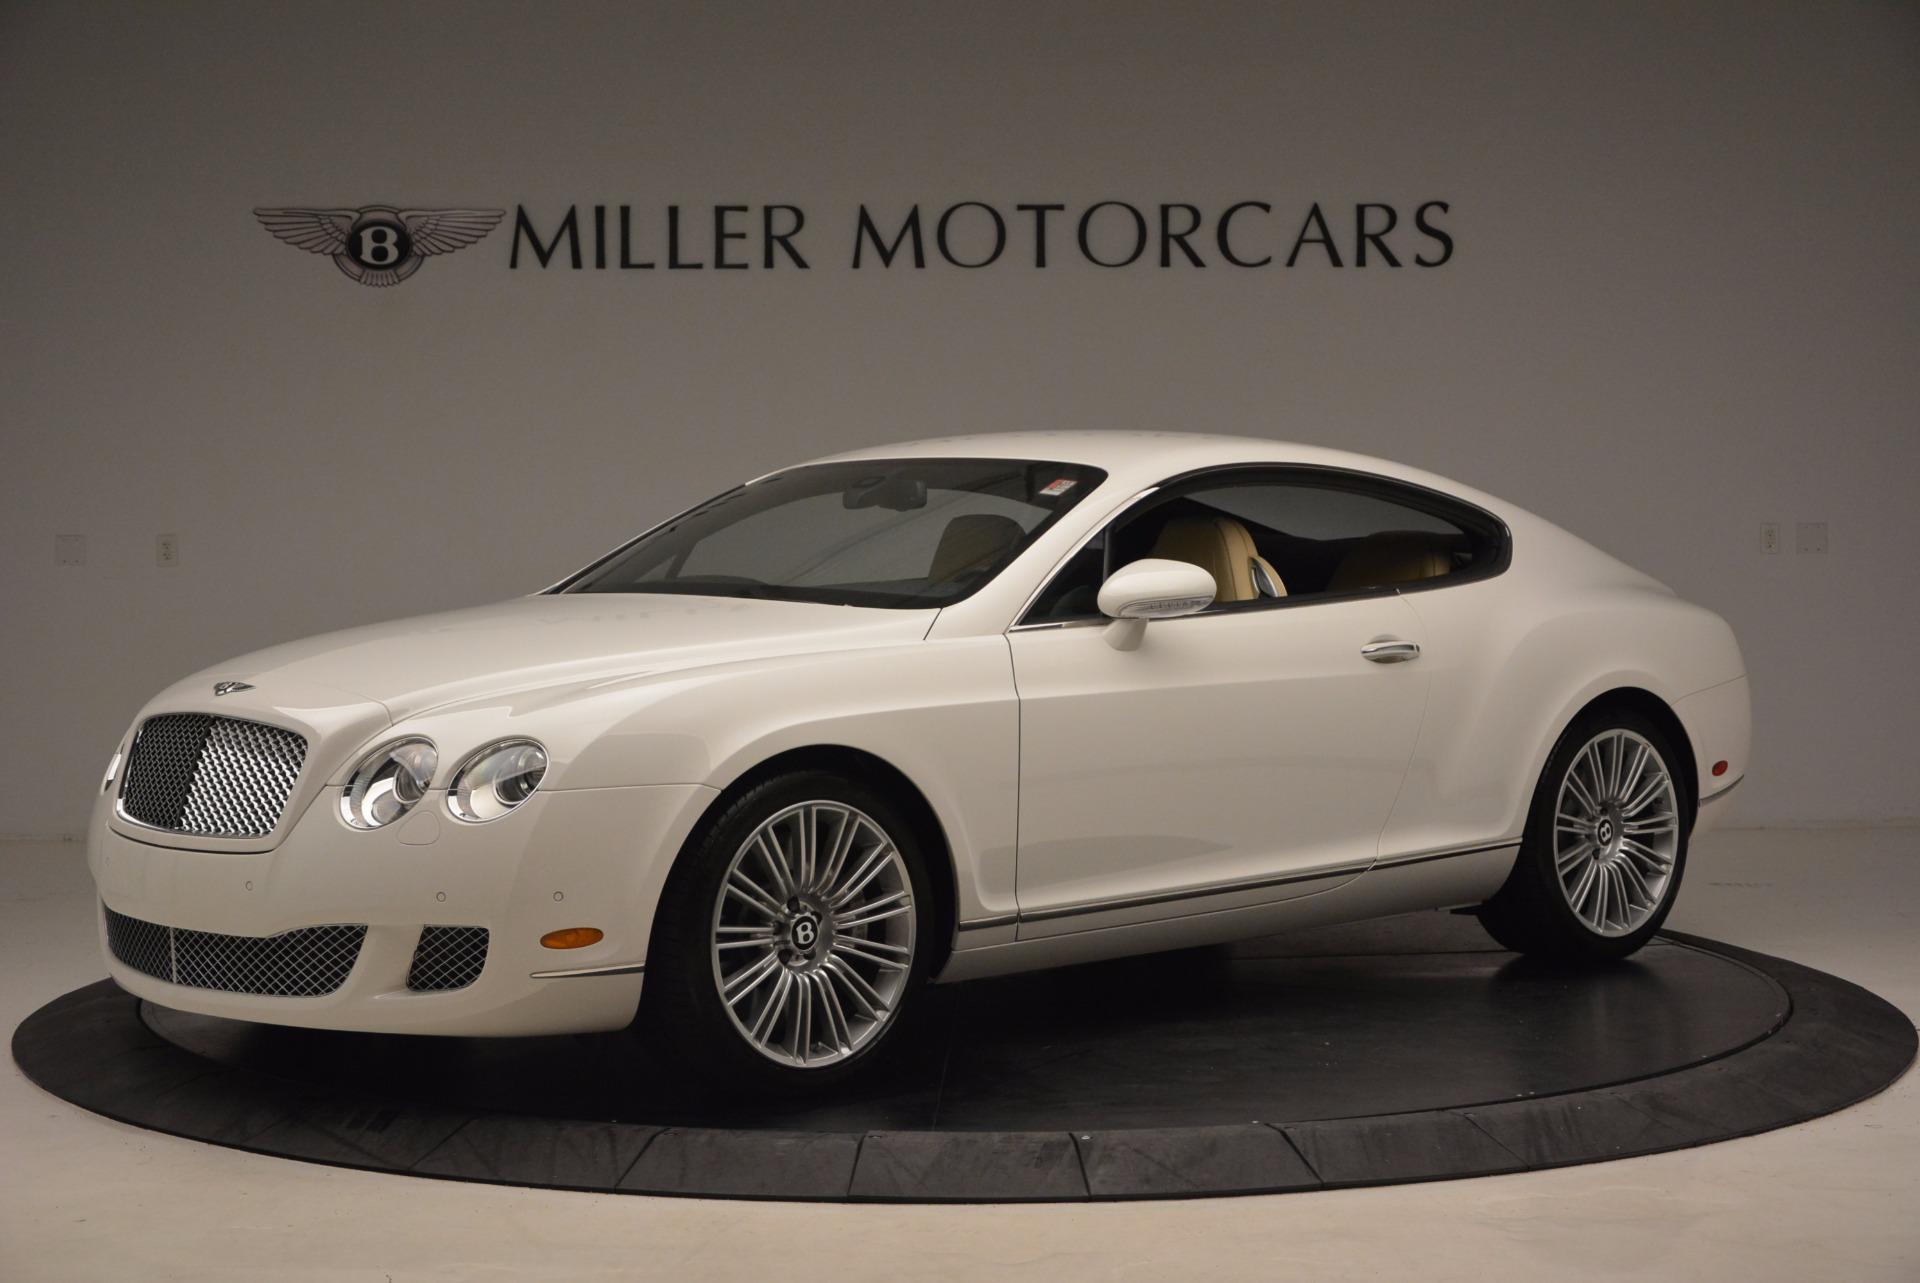 Used 2008 Bentley Continental GT Speed For Sale In Westport, CT 1552_p2